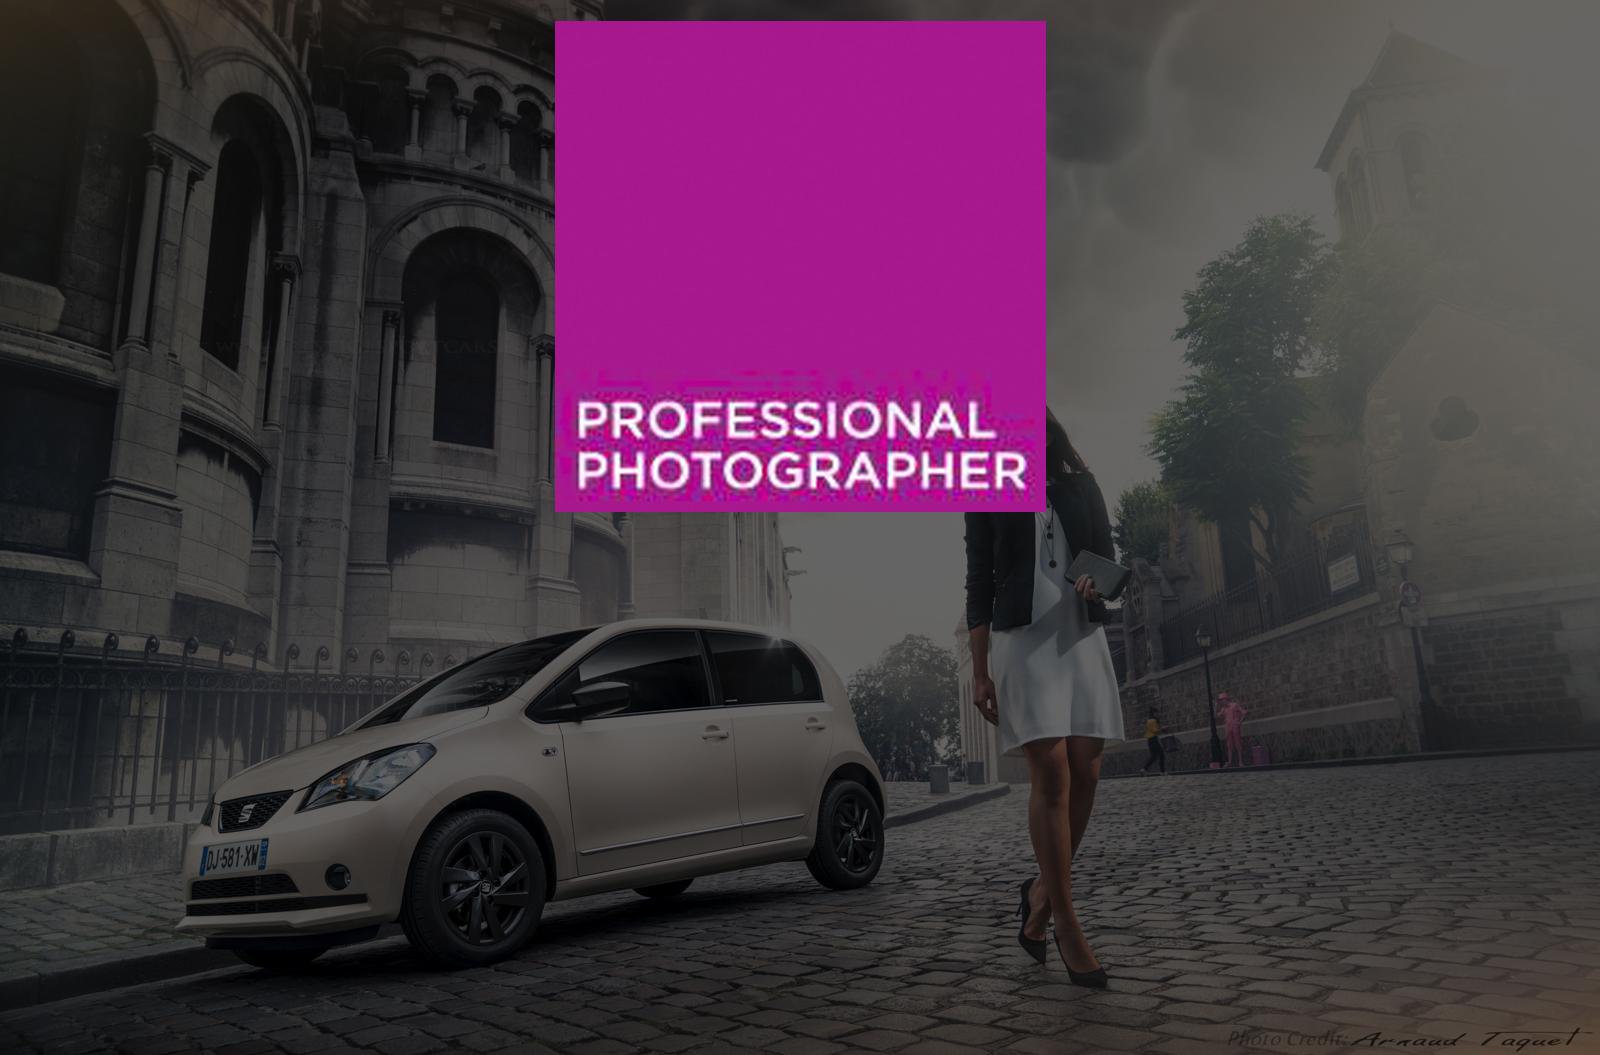 PROFESSIONAL PHOTOGRAPHER ( 2015 )